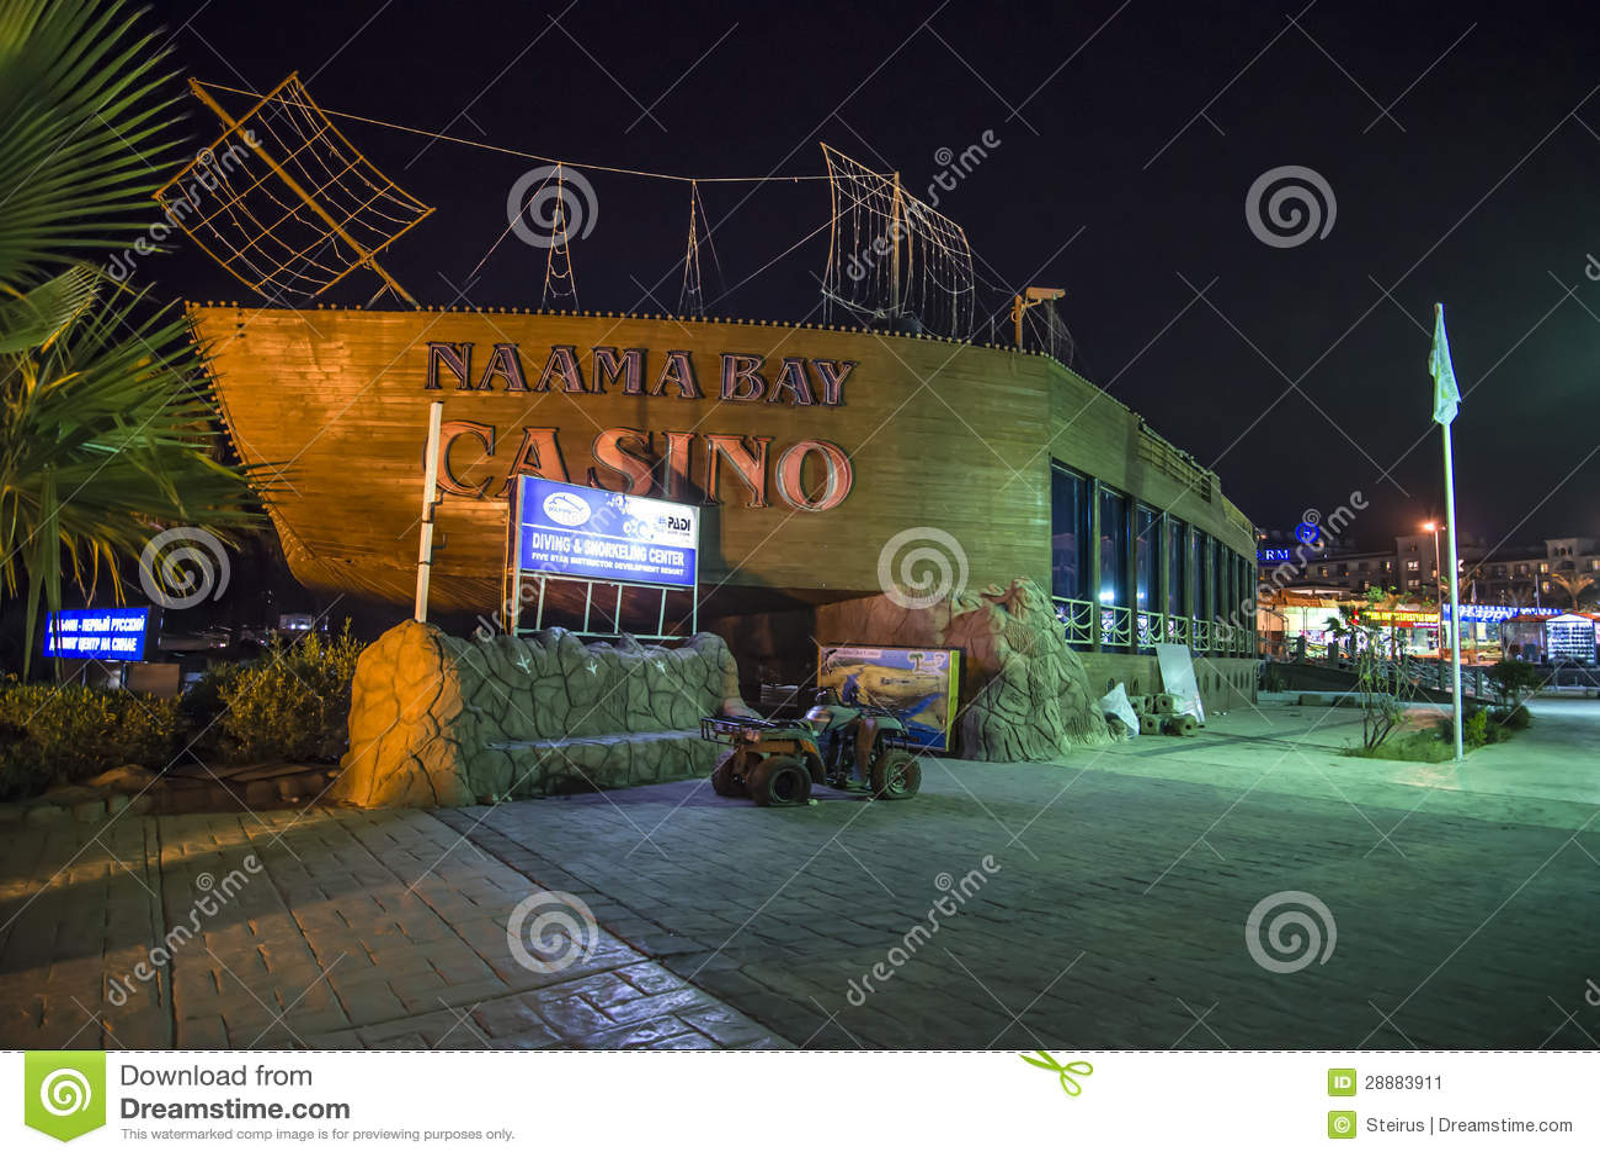 casino naama bay